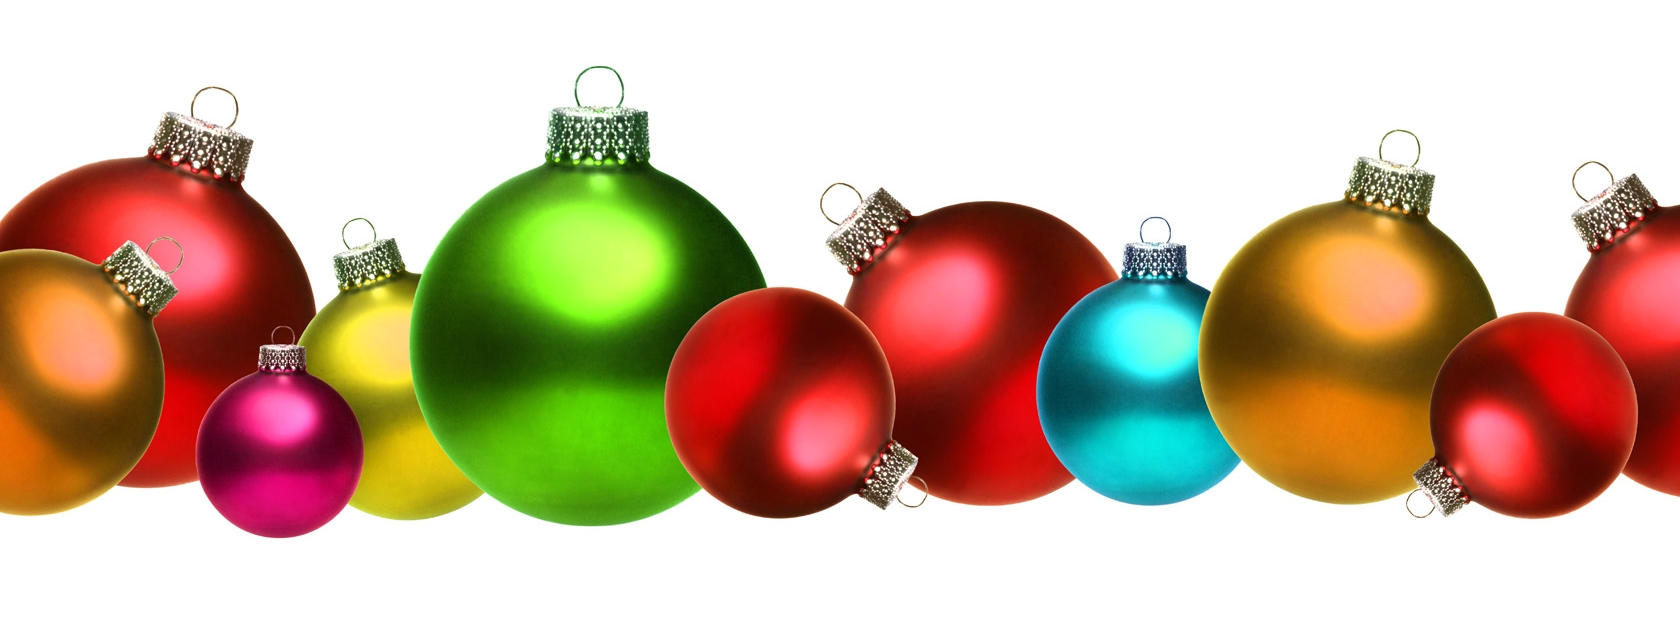 free_wallpaper_1680x1050_christmas_decorations_ball.jpeg